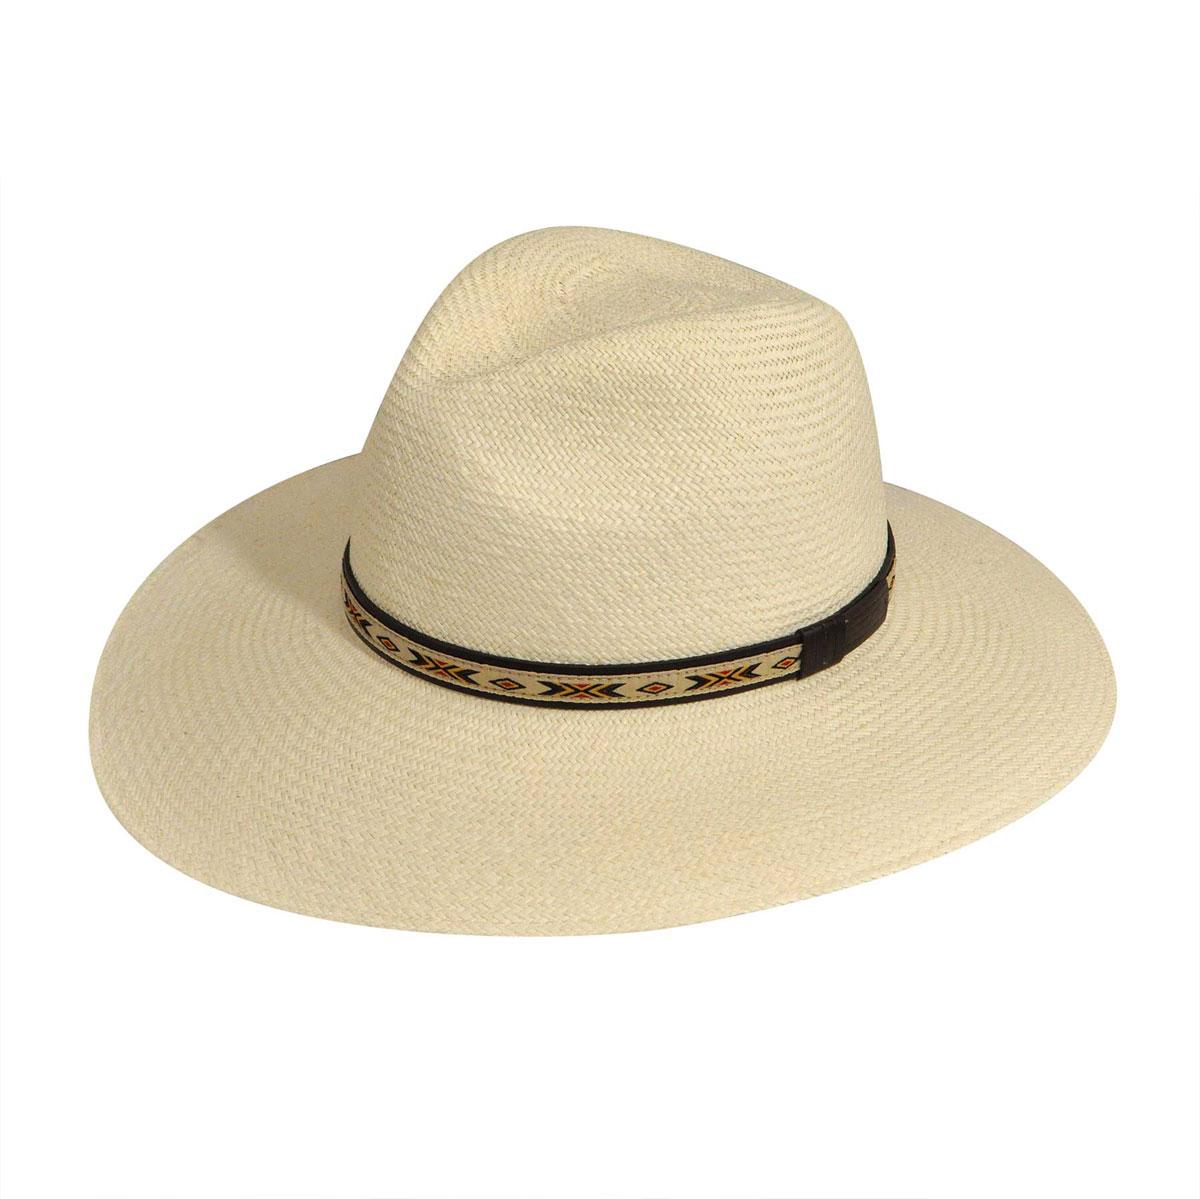 1960s – 70s Style Men's Hats Southwest Sunblocker Fedora $148.00 AT vintagedancer.com